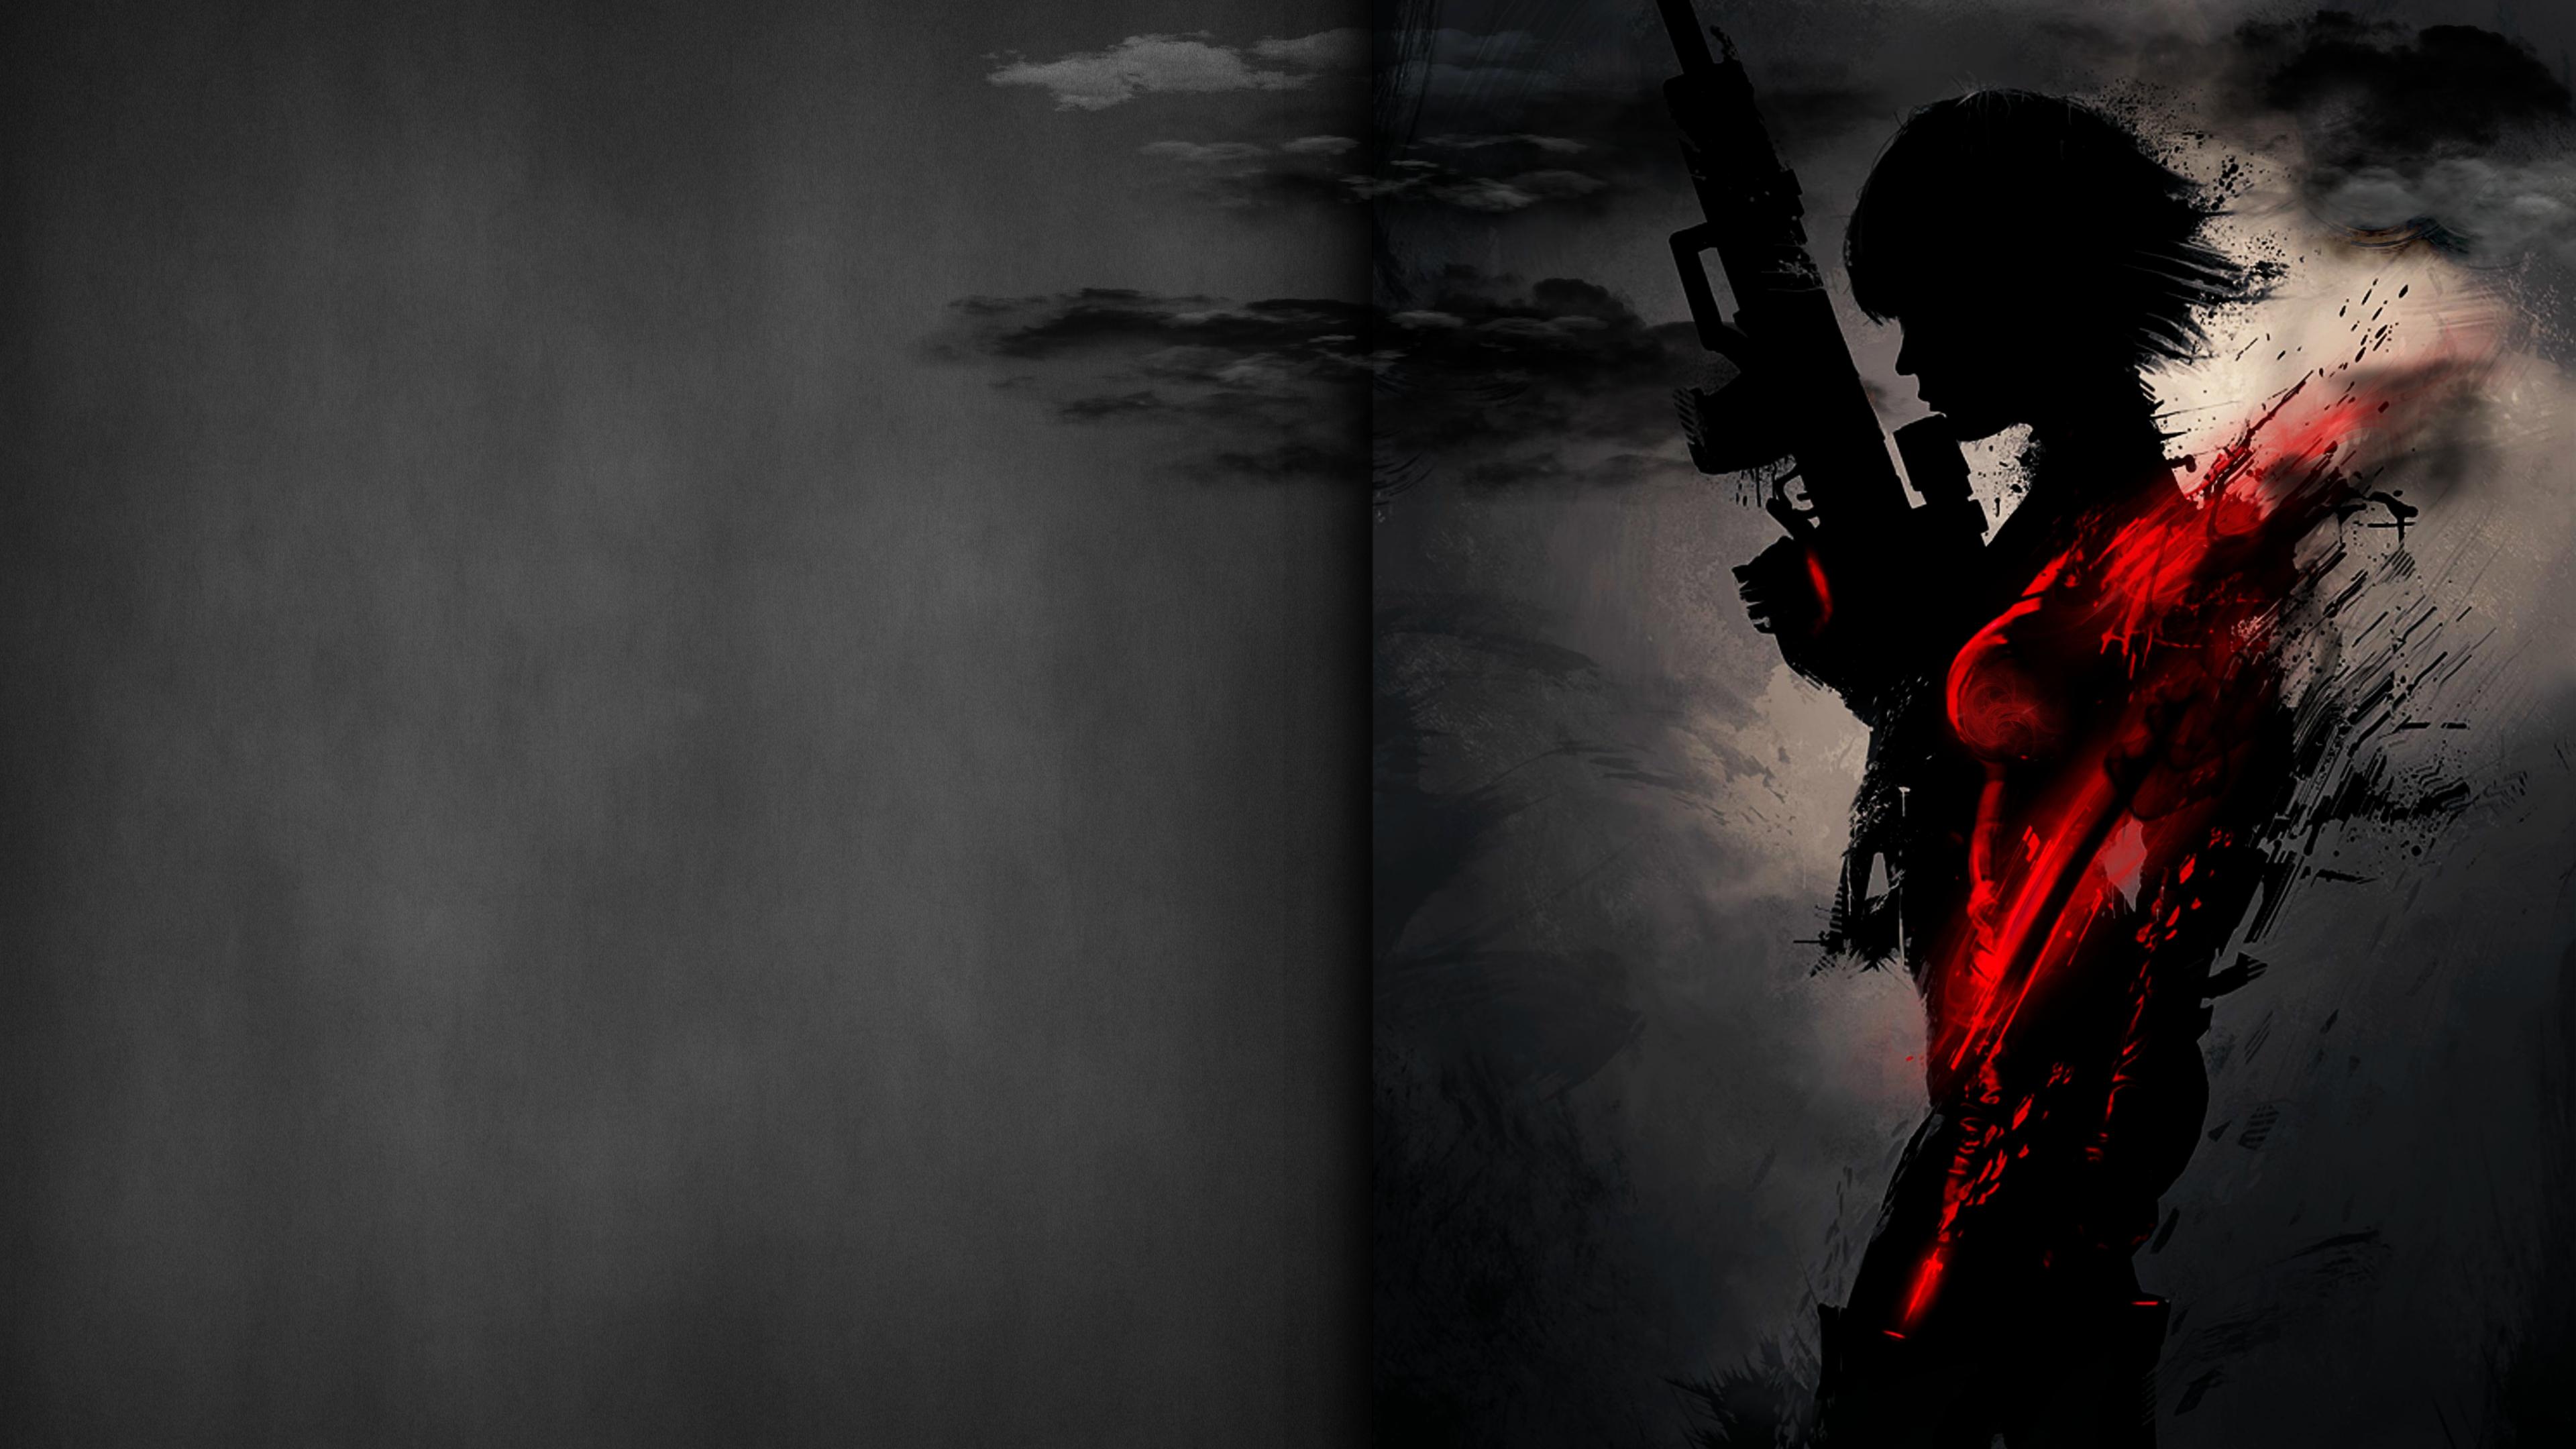 1920x1080 Sniper Artwork Dark Red 4k Laptop Full HD 1080P ...